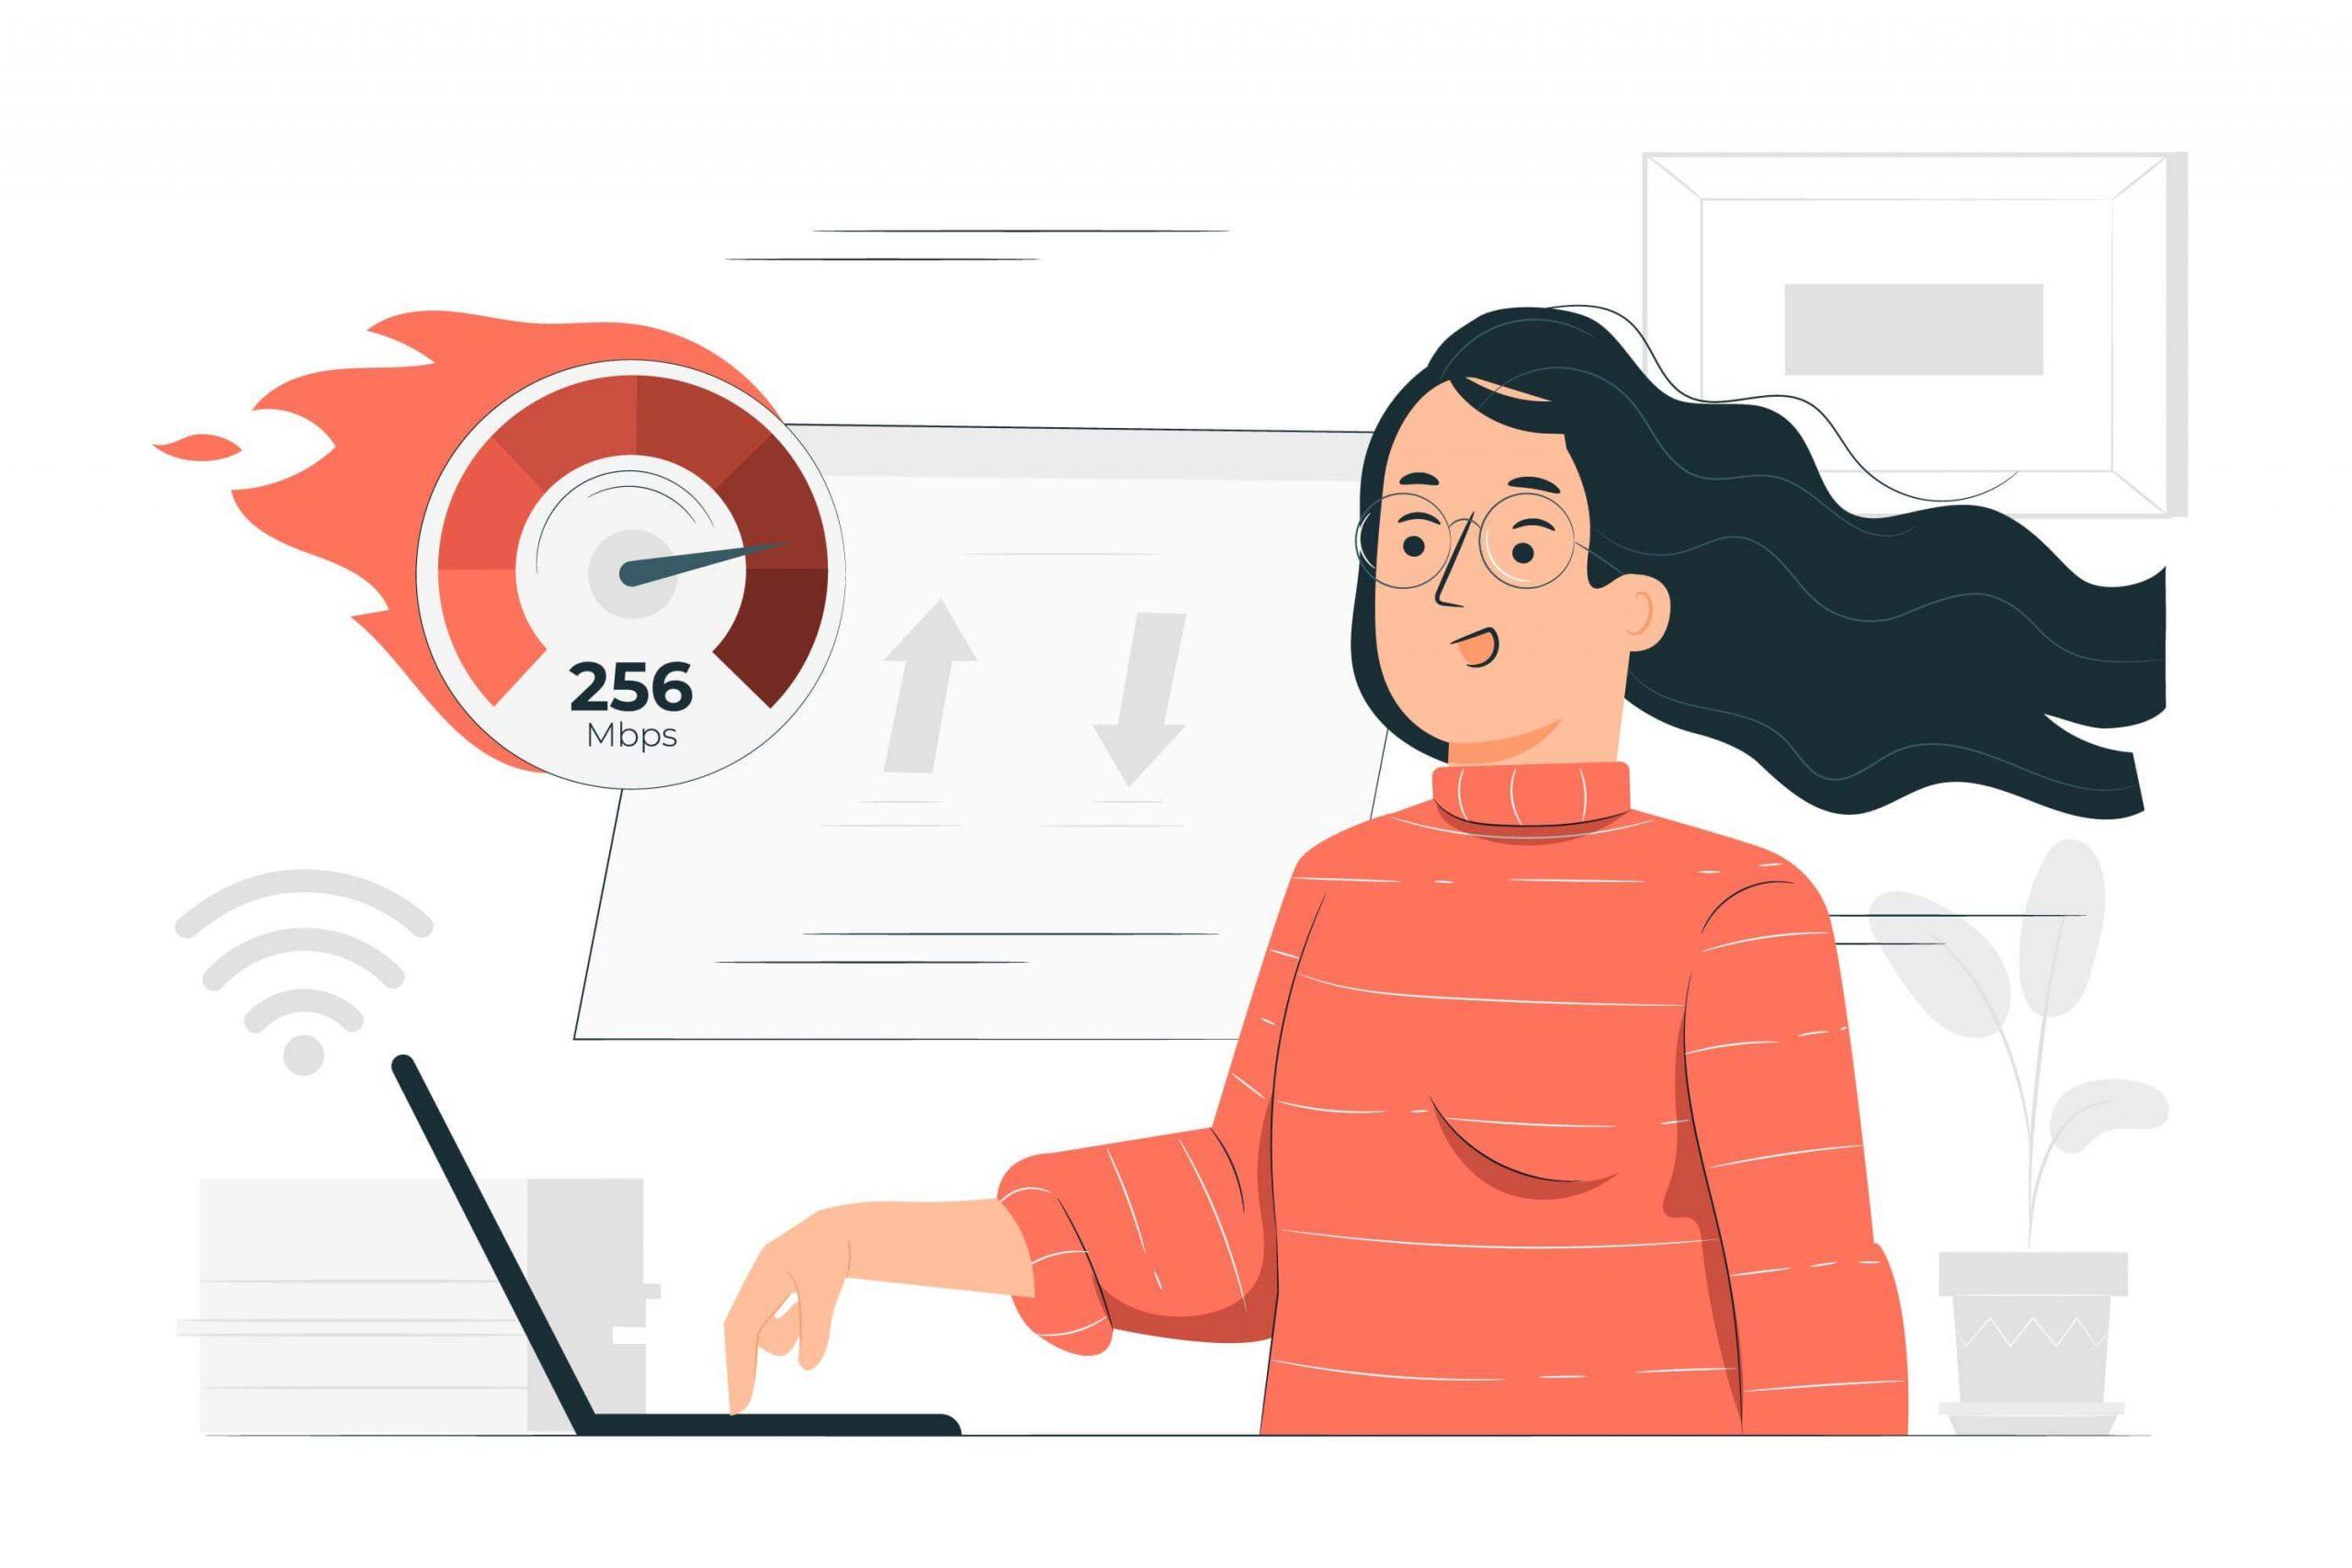 Cara Meningkatkan Kecepatan Website yang Perlu Anda Ketahui